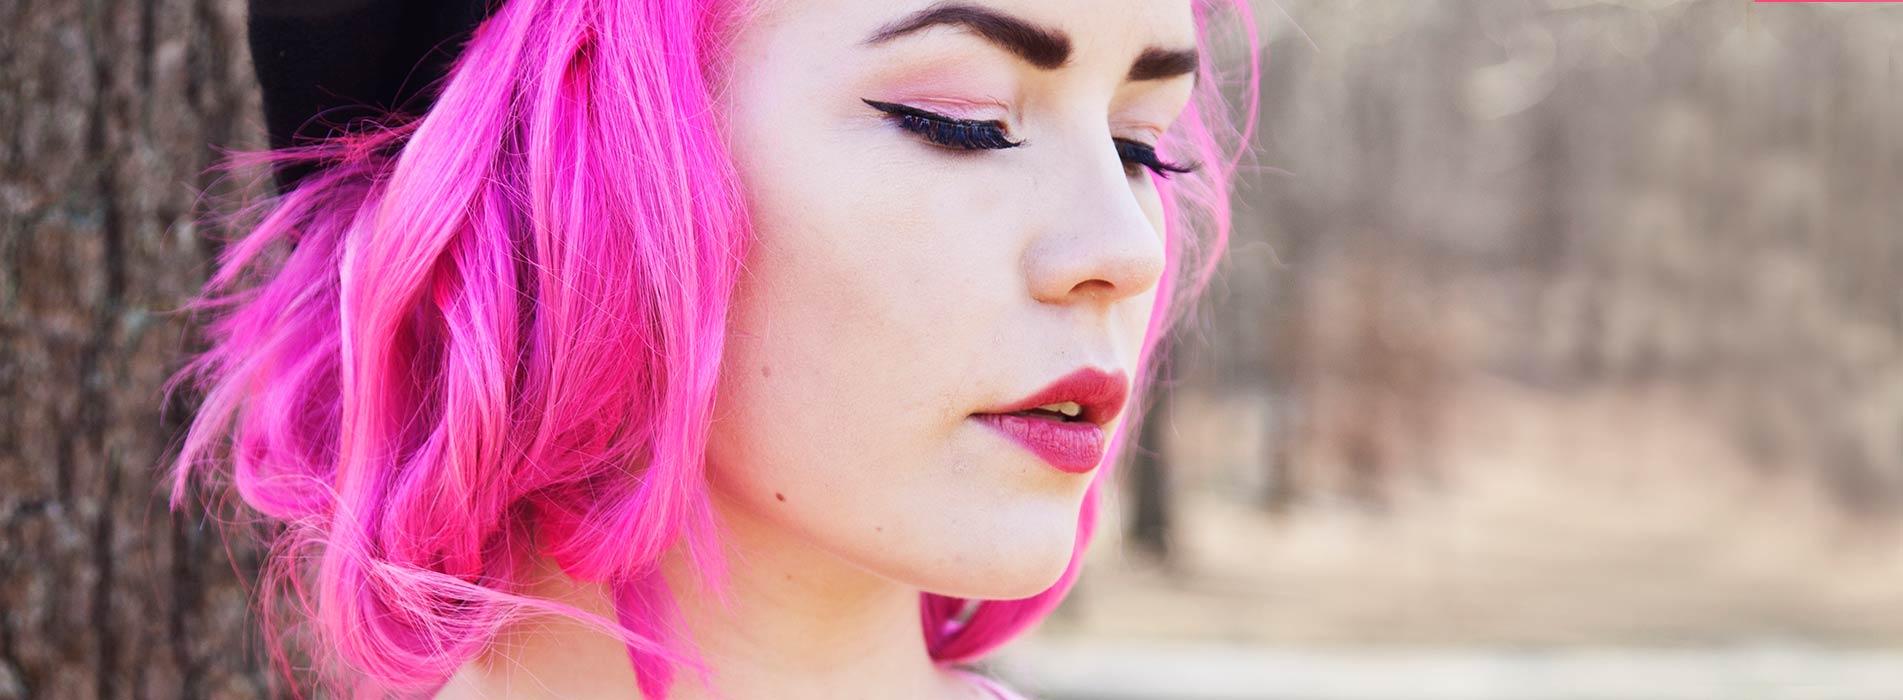 rosa hårfärg online